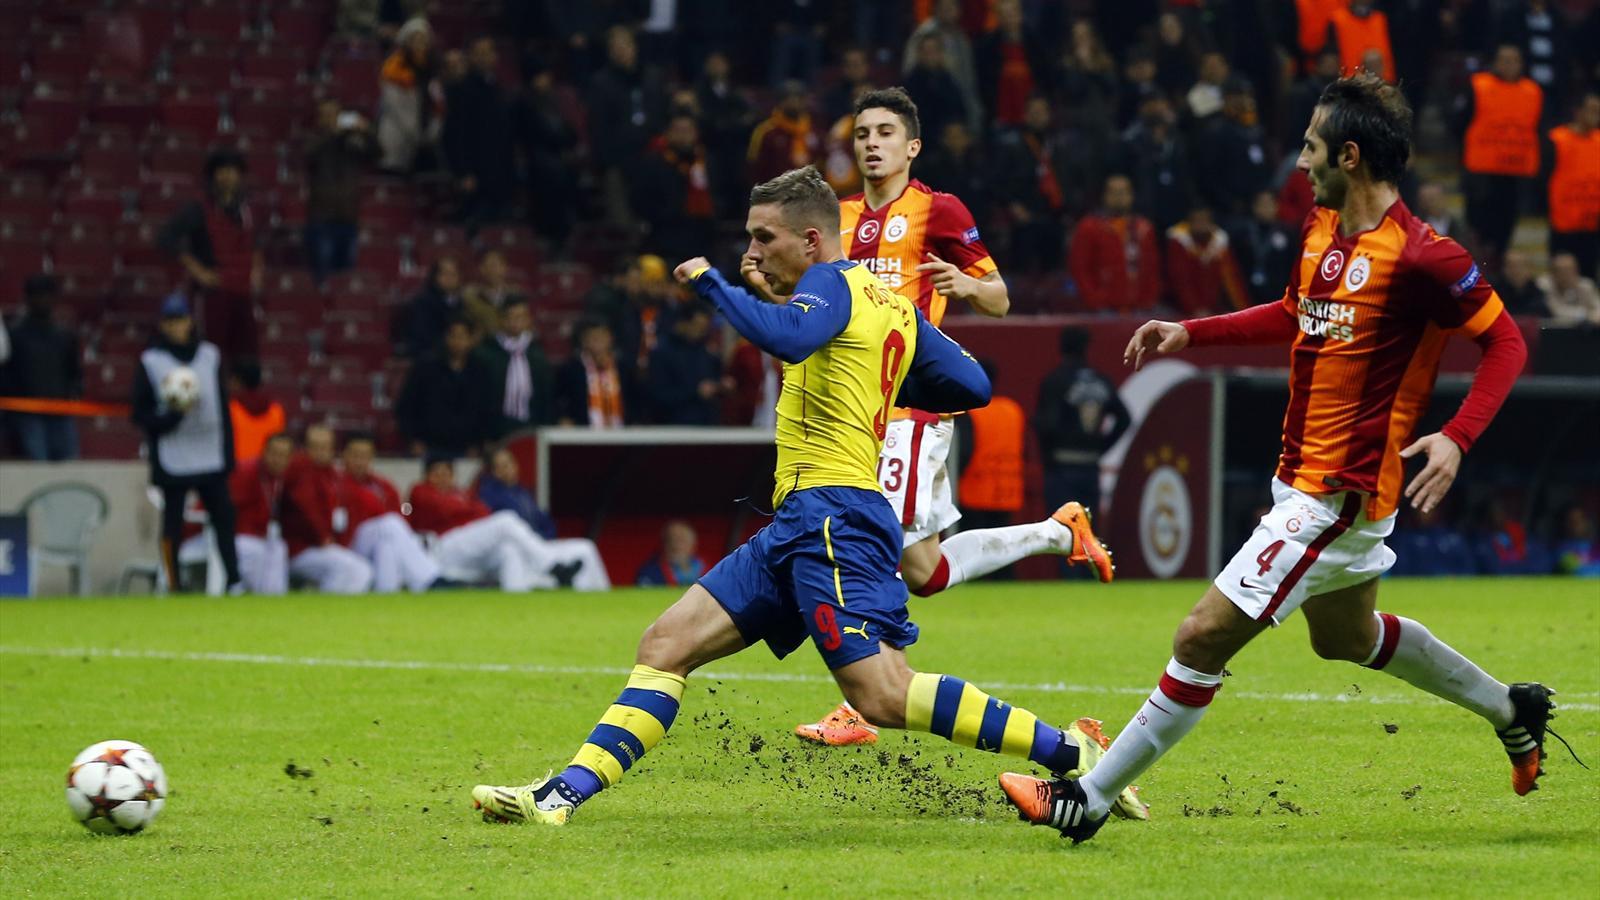 Podolski scored against Galatasaray twice in last season's Champions League